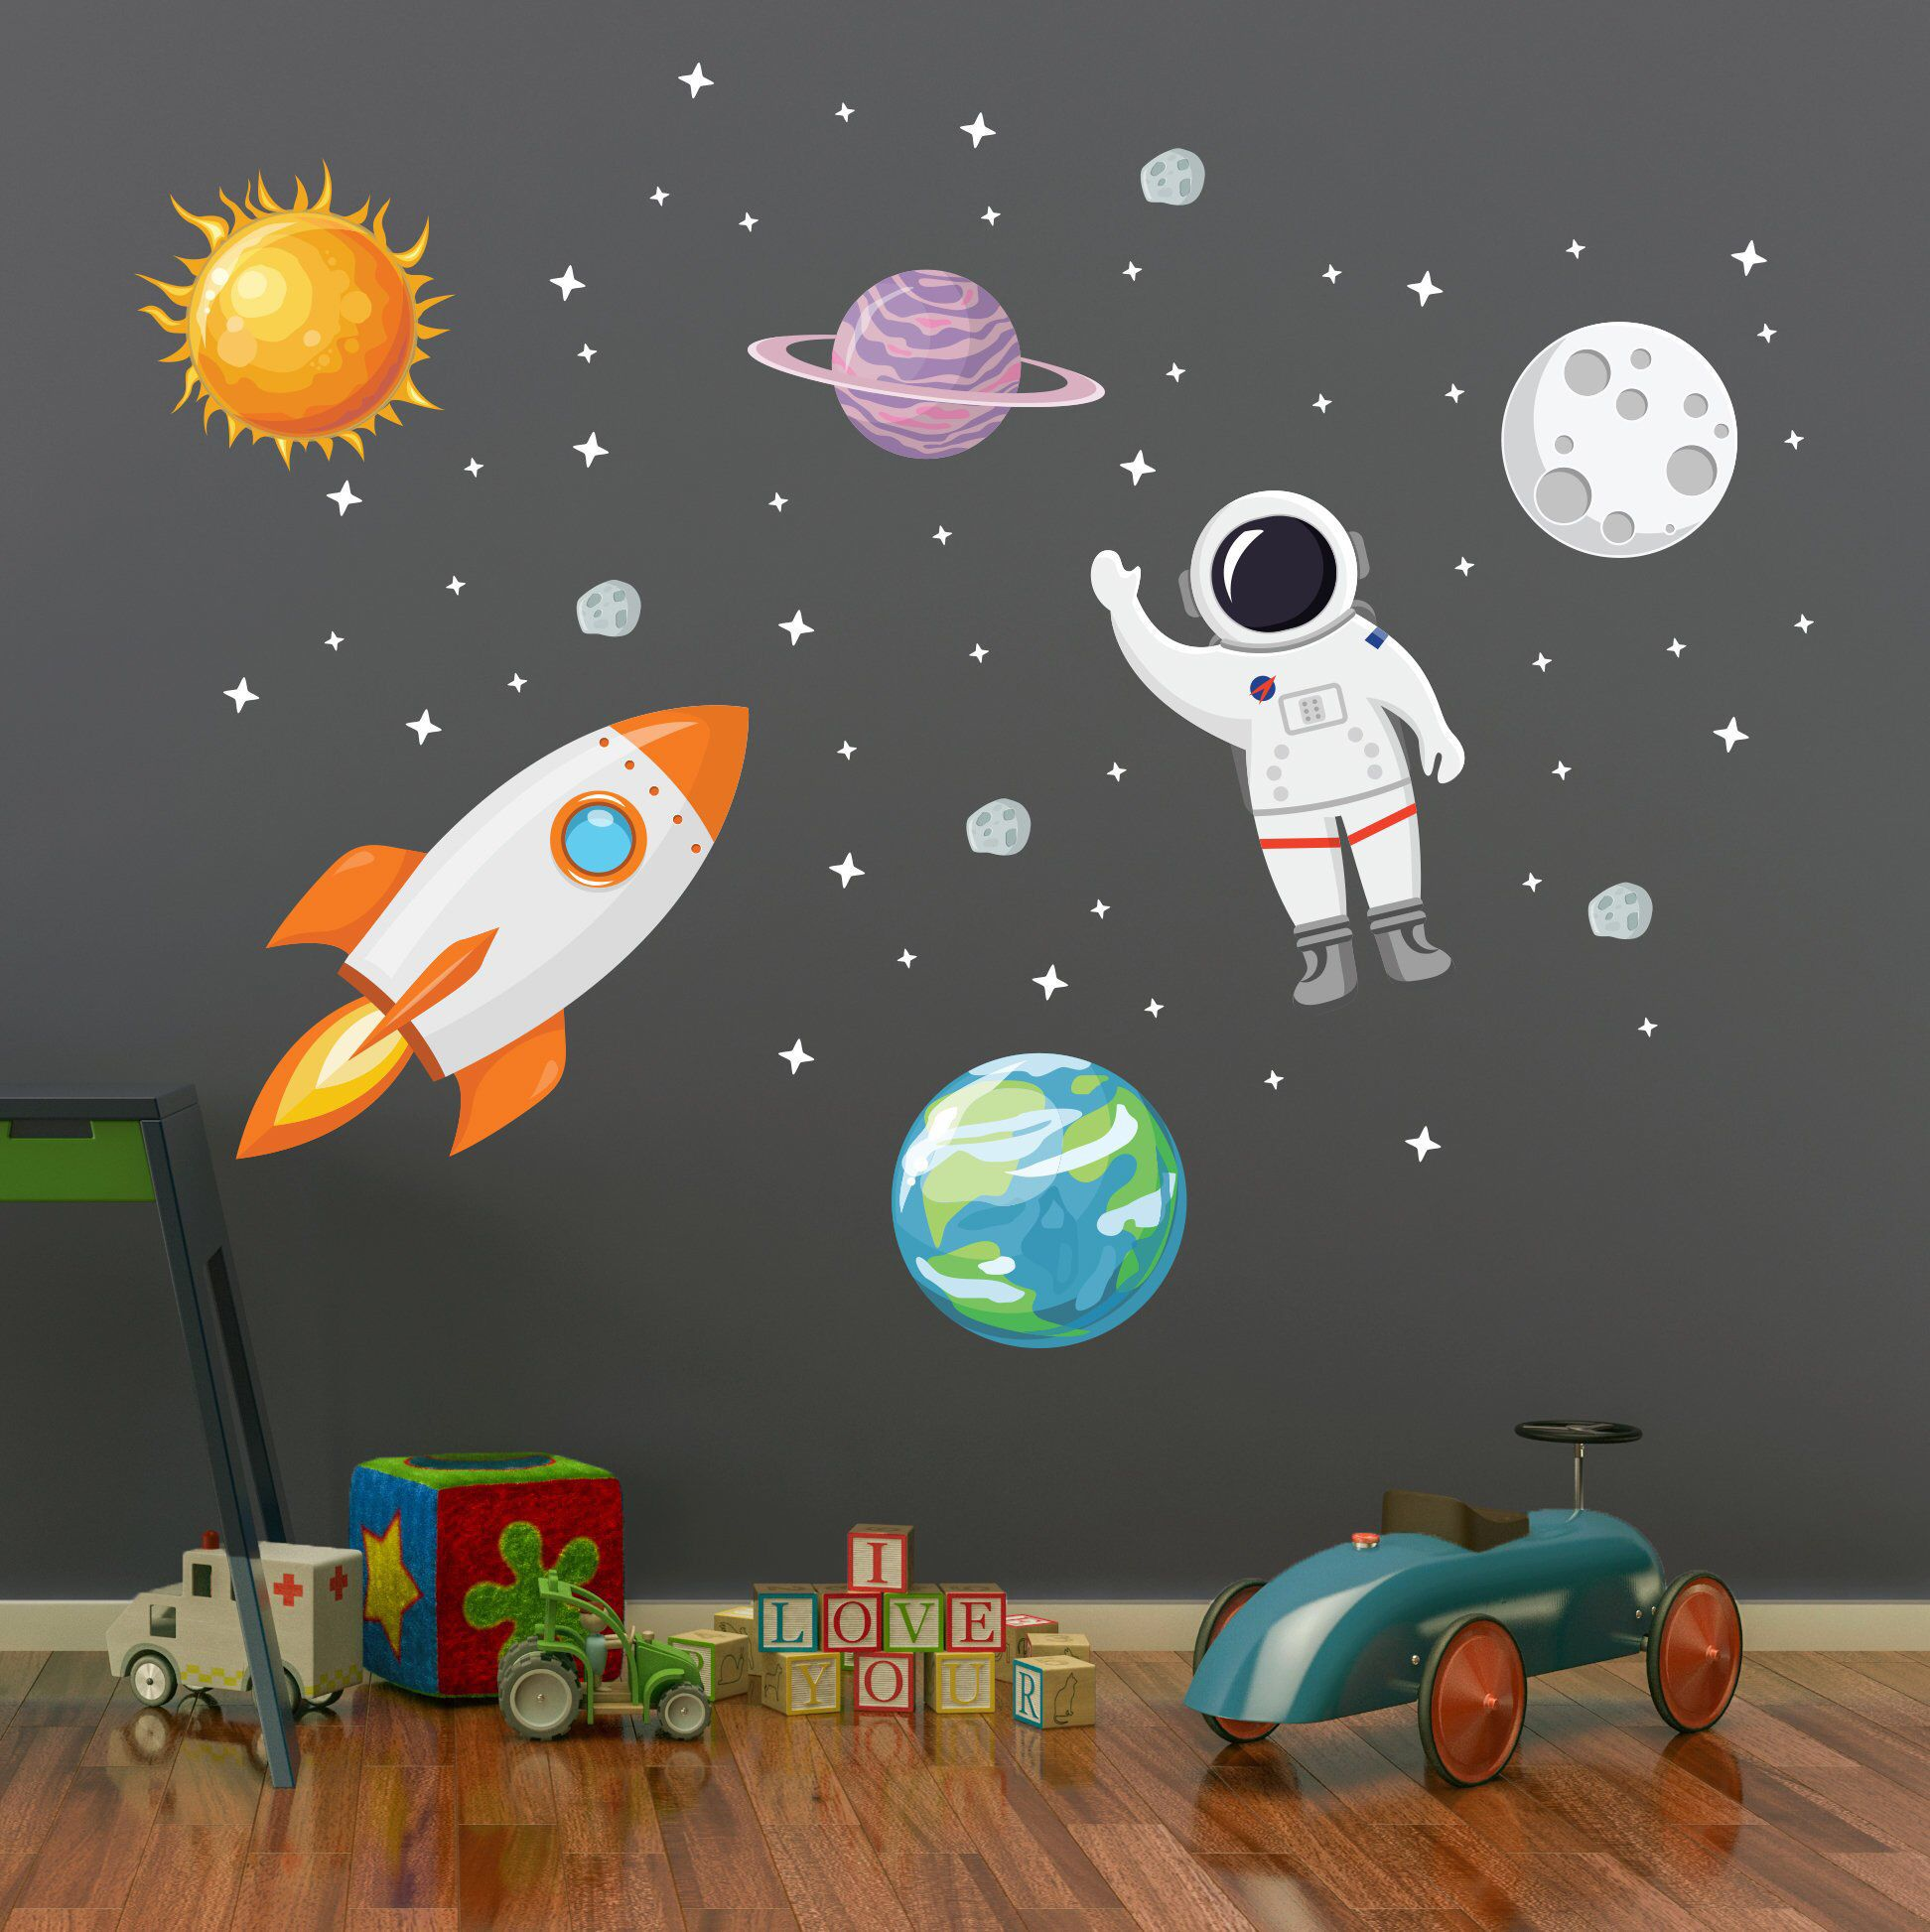 Weltraum Wand Aufkleber Sterne Planeten Astronaut Rakete Solar